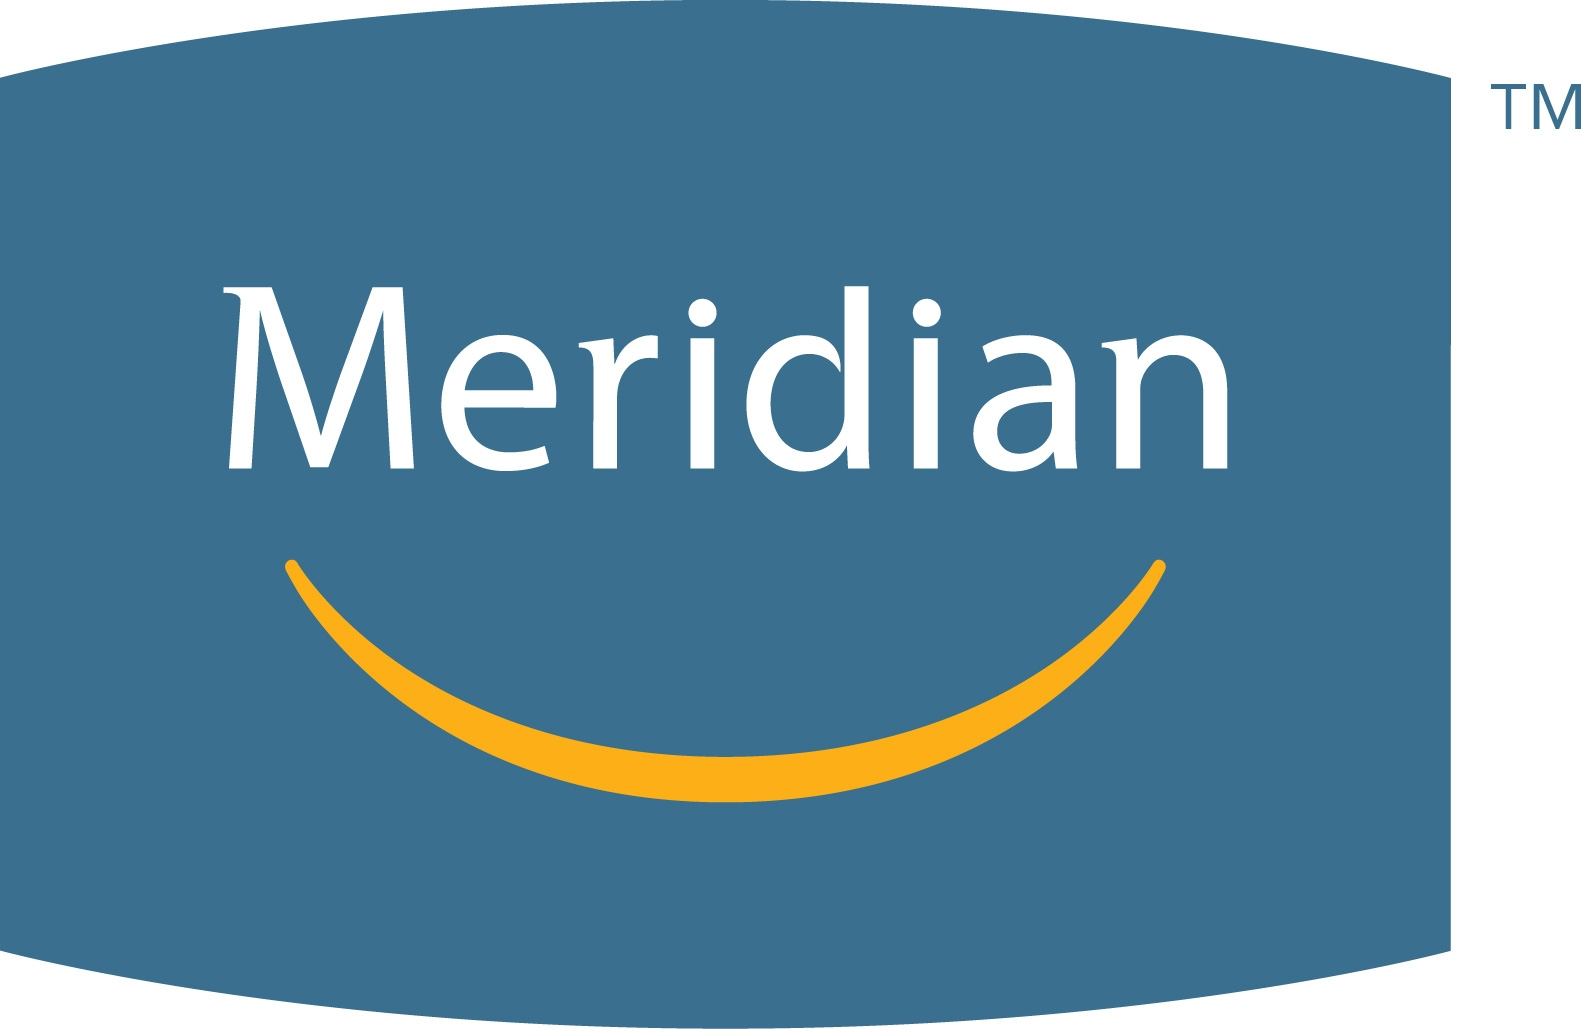 Over Half Of Us To Get Online Mortgages Meridian Cu Ratespy Com